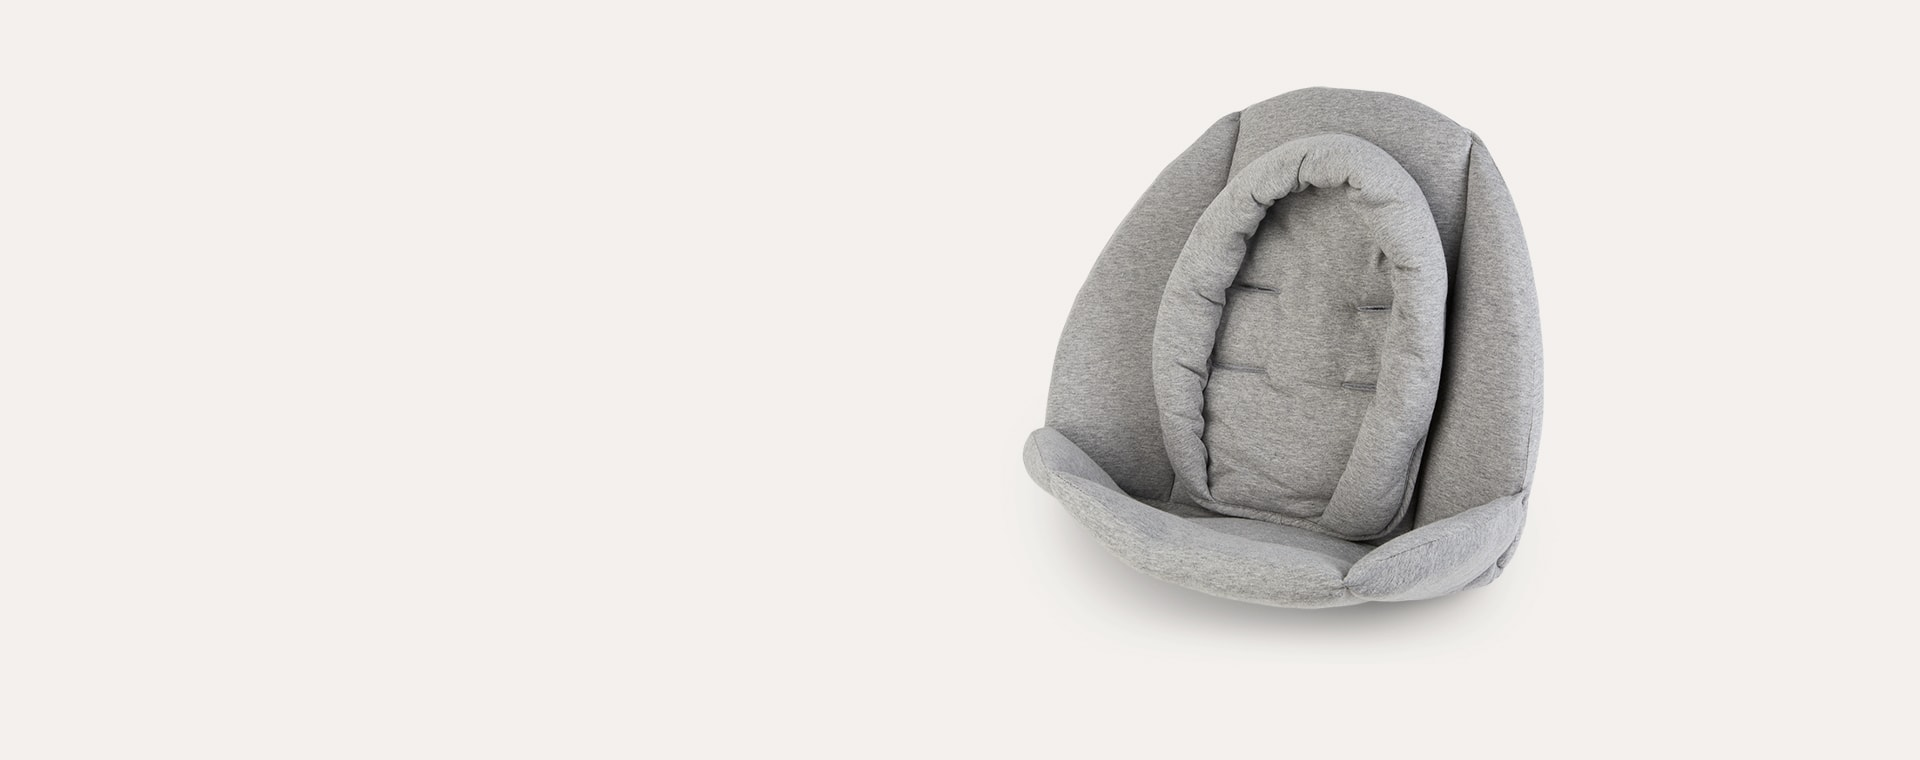 Grey Childhome Evolu Newborn Jersey Seat Cushion